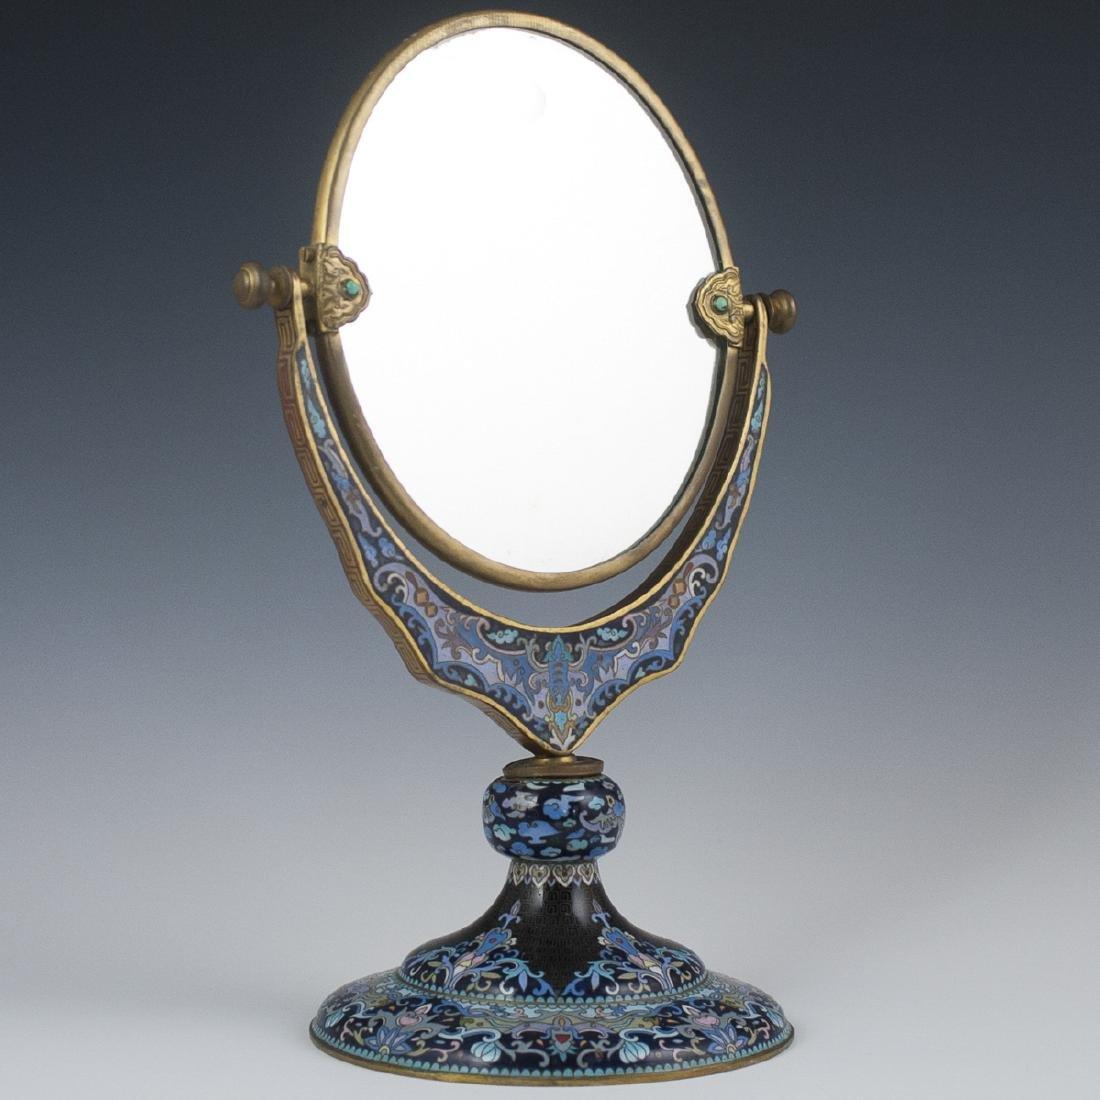 Chinese Cloisonne Enameled Vanity Mirror